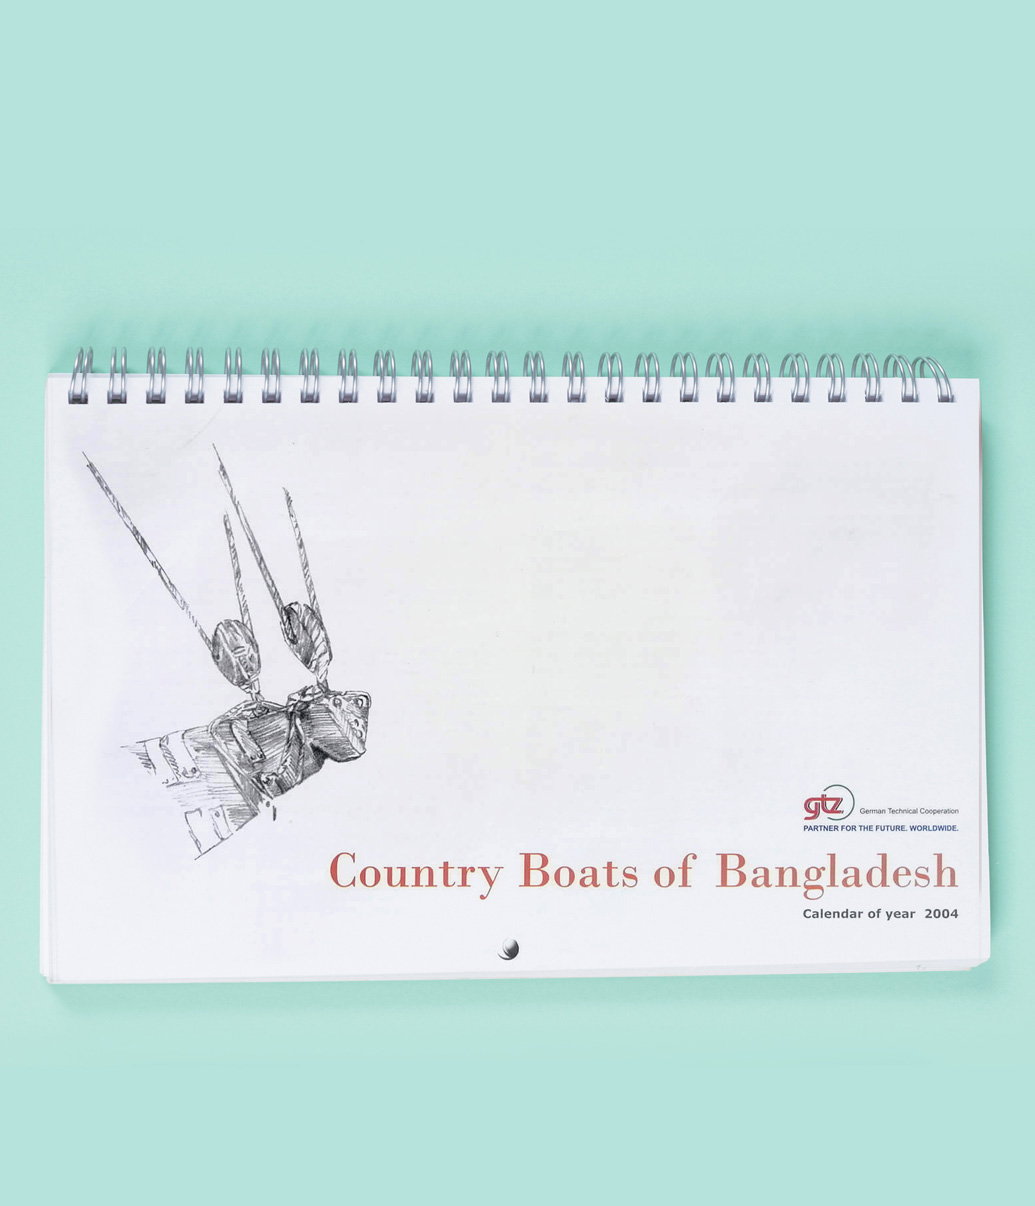 Country-Boats-of-Bangladesh-Calendar-2004